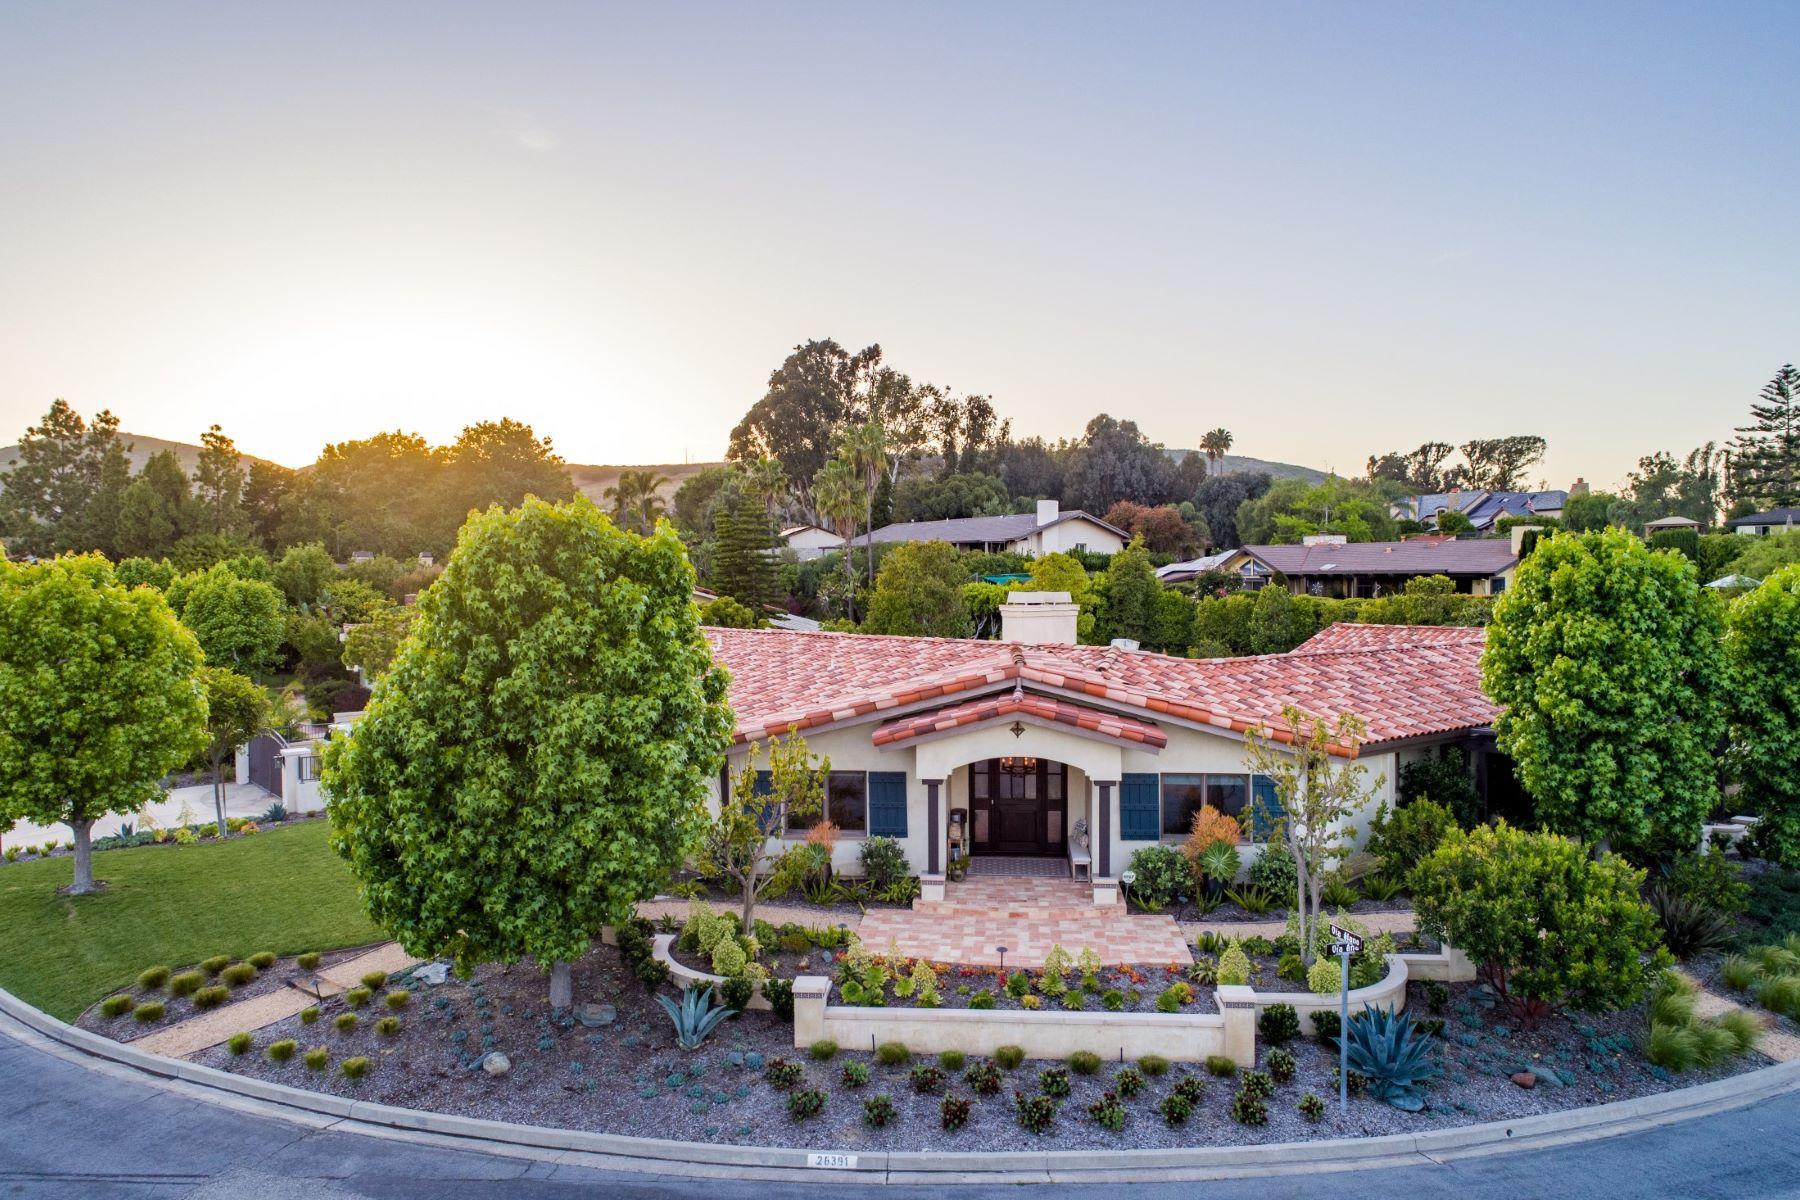 Single Family Homes for Sale at 26391 Via Alano, San Juan Capistrano 26391 Via Alano San Juan Capistrano, California 92675 United States